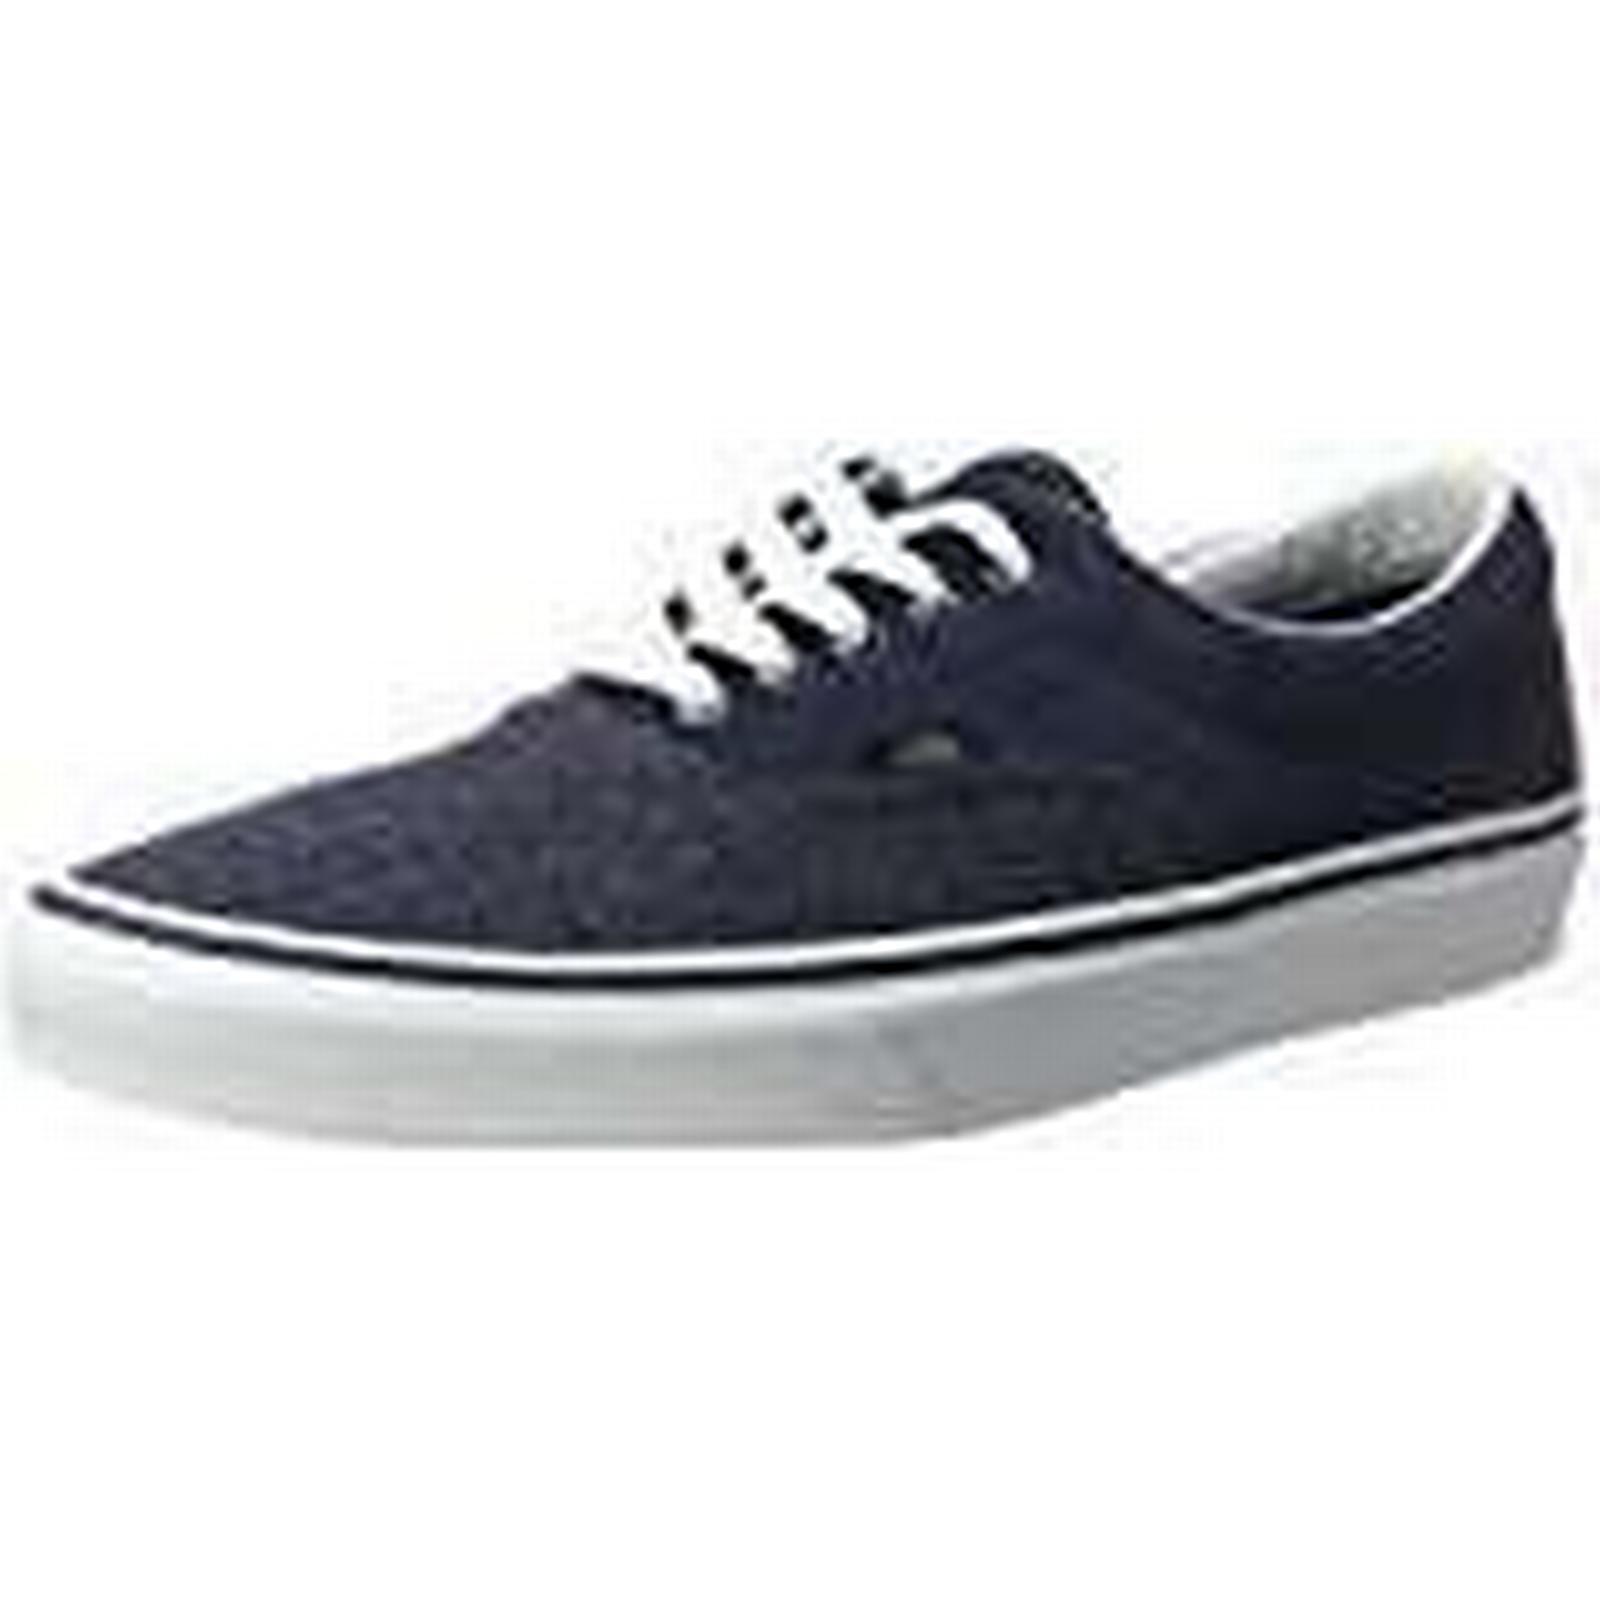 561a6e4cd3df7 Vans Men s Blue Dress suedesuiting Era Trainers U0xUq1